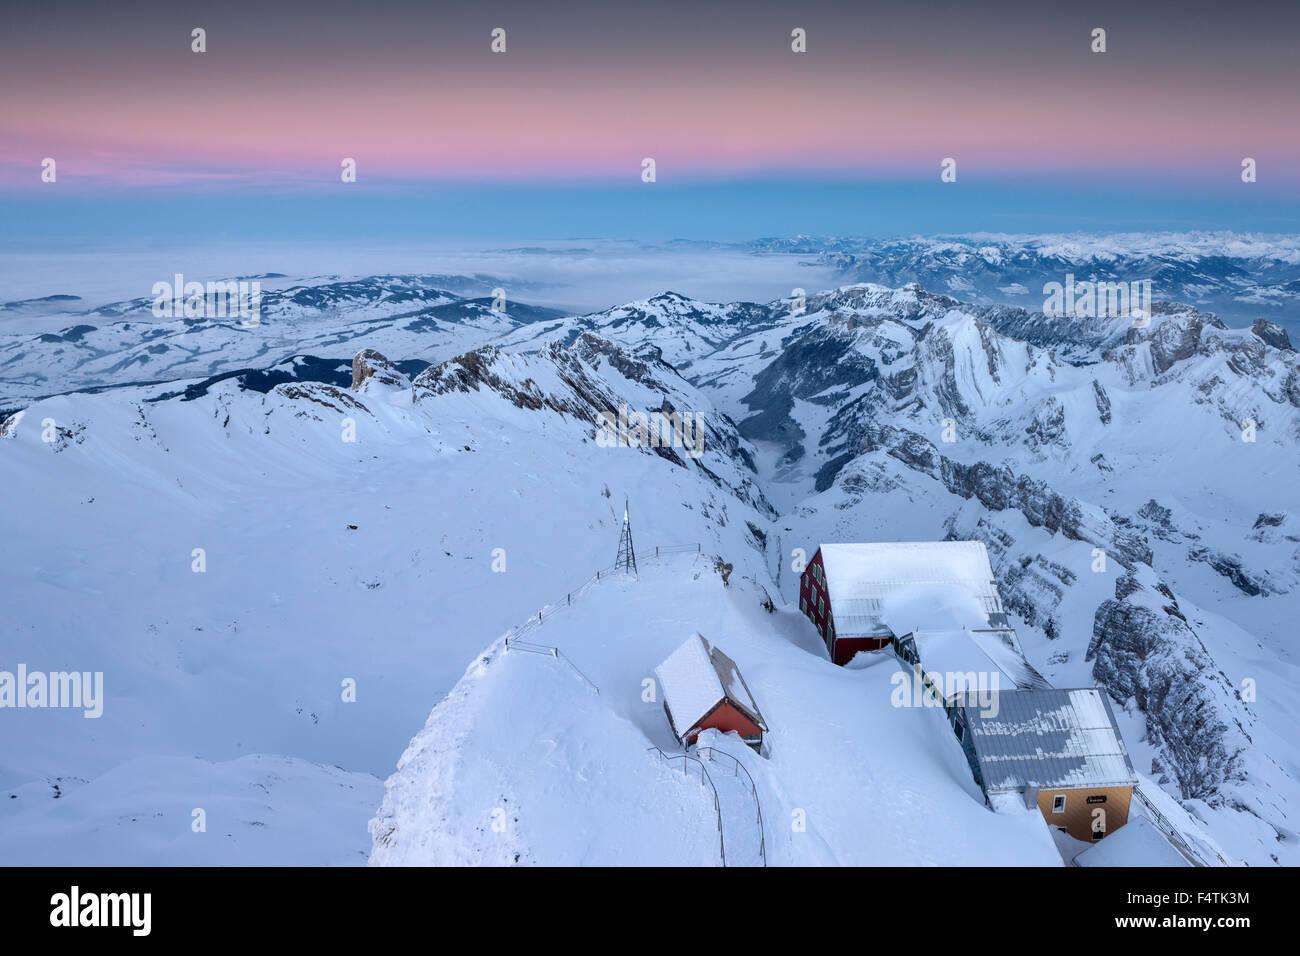 Ansicht, Vista, Säntis, Schweiz, Kanton Appenzell, Appenzell Innerrhoden, Alpstein, Inn, Alter Säntis, Stockbild